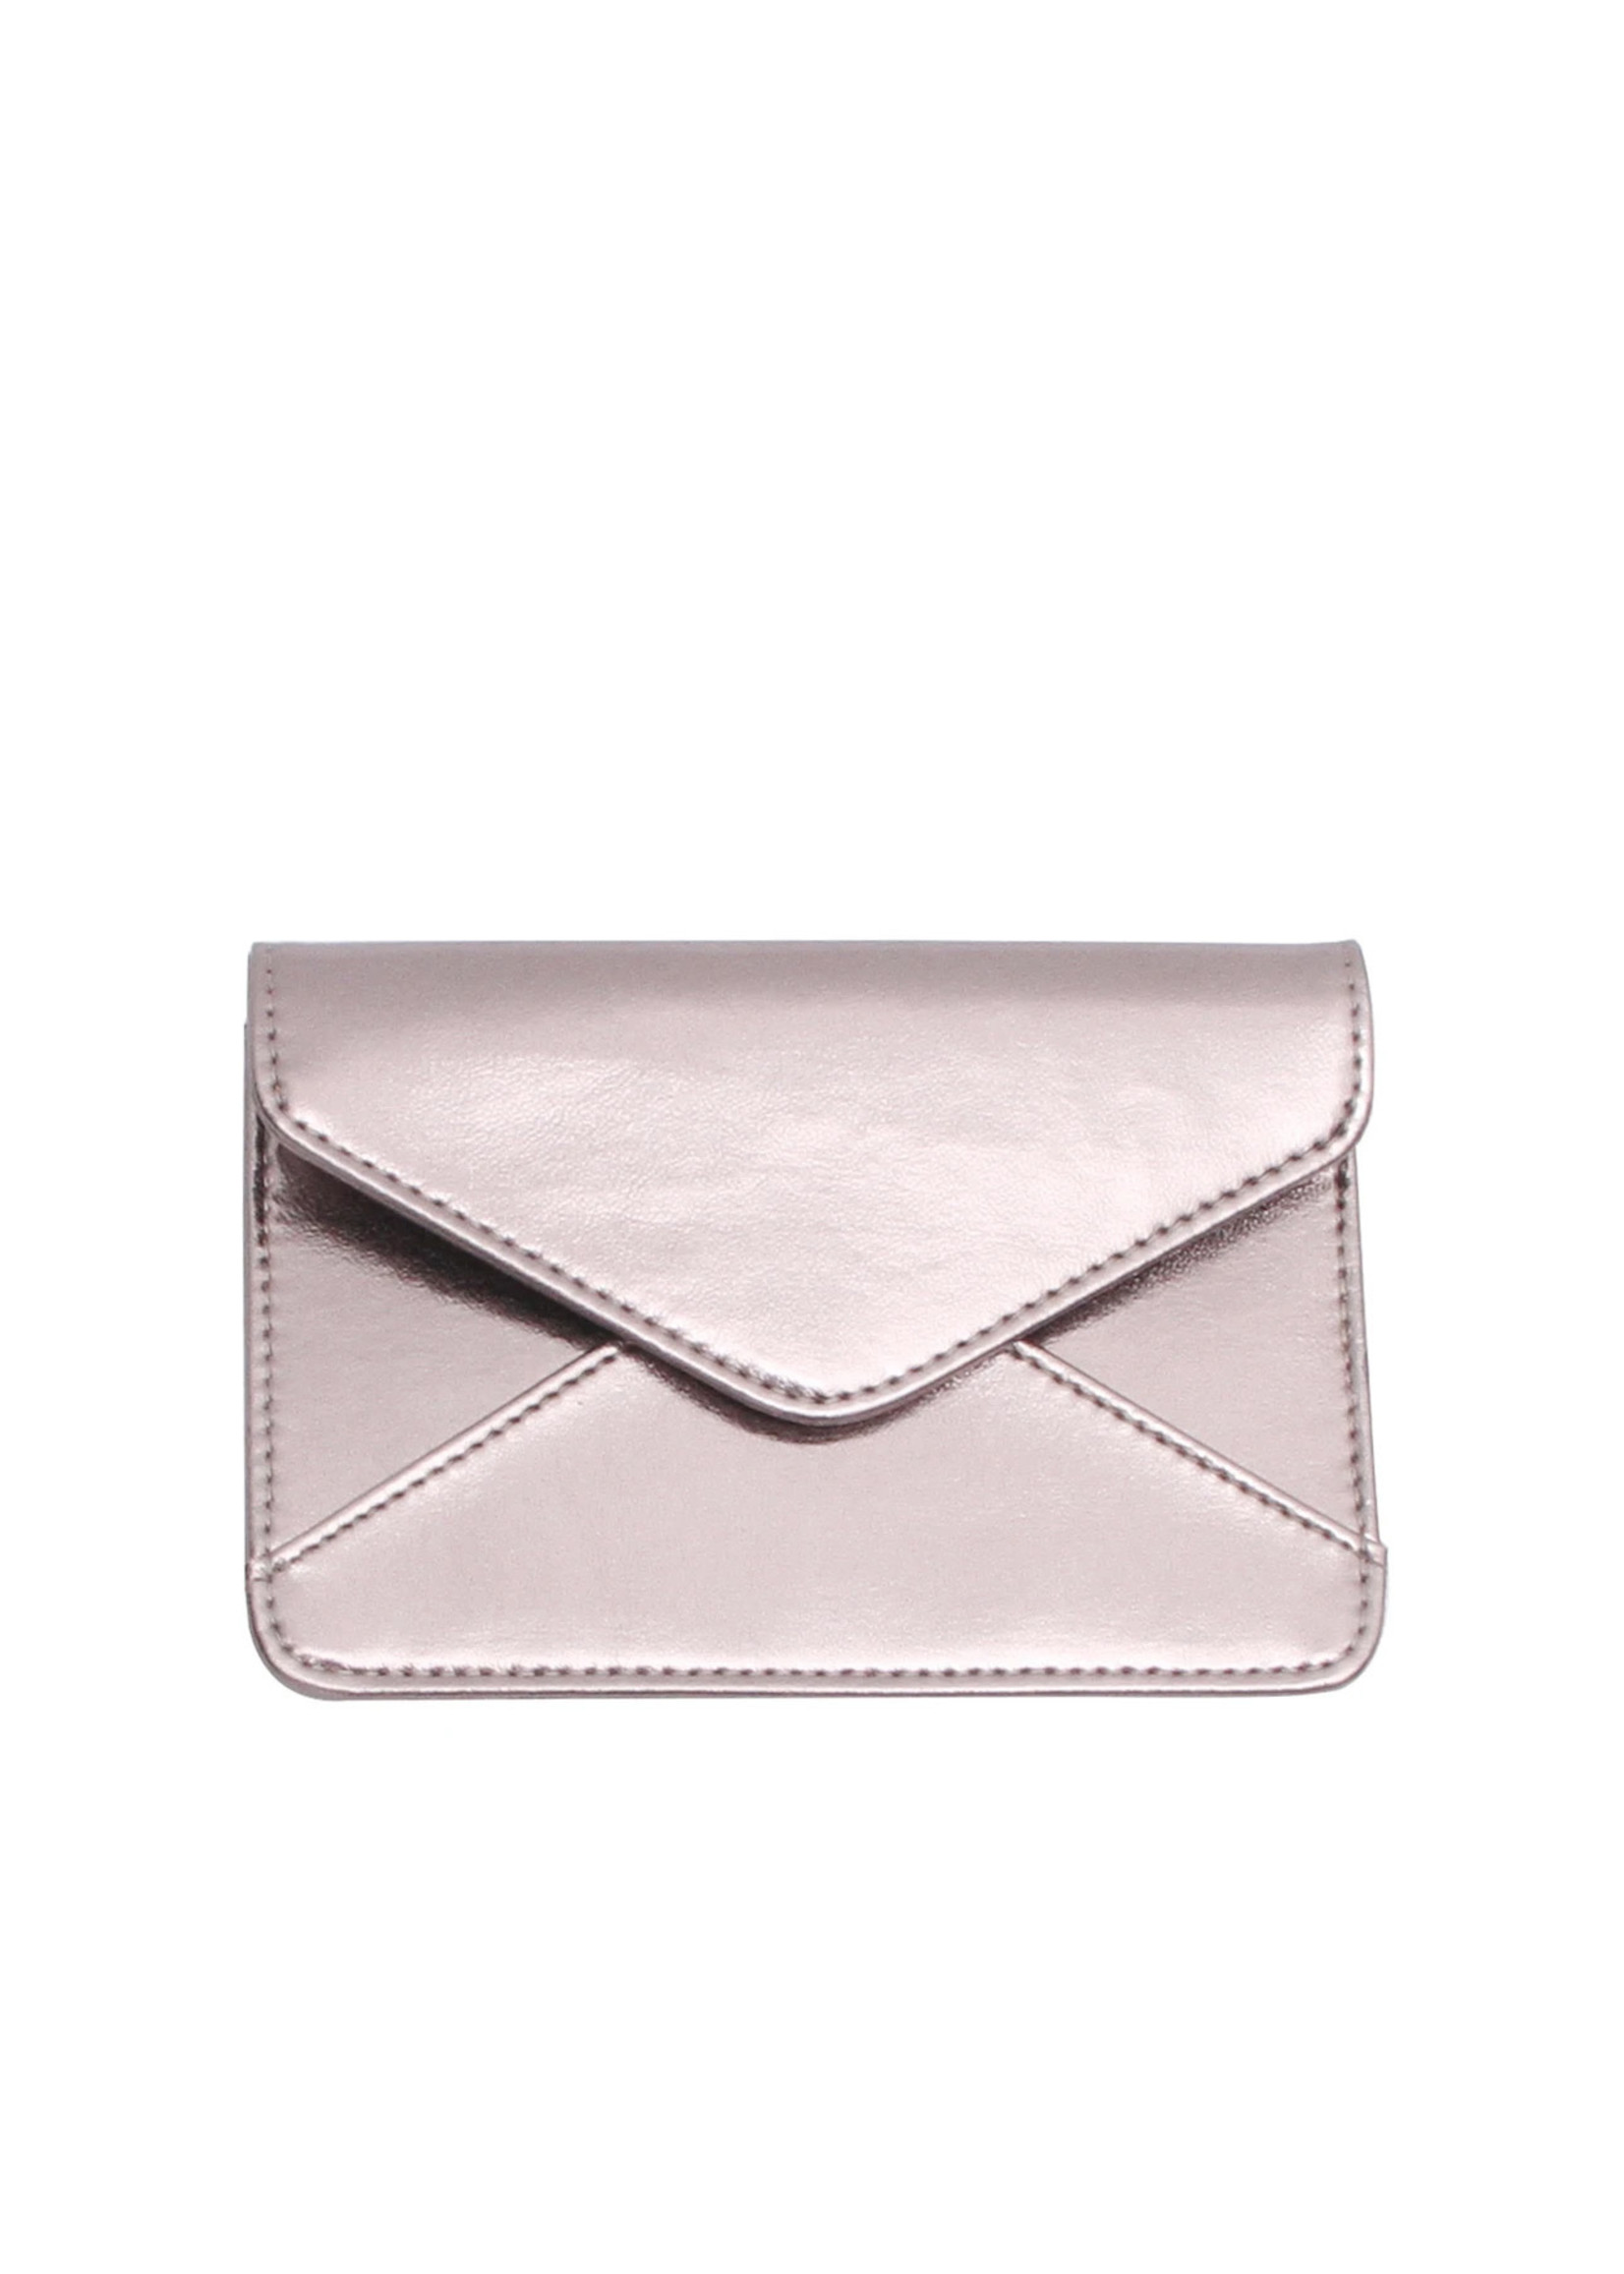 Denise Roobol Mini Wallet Metallic